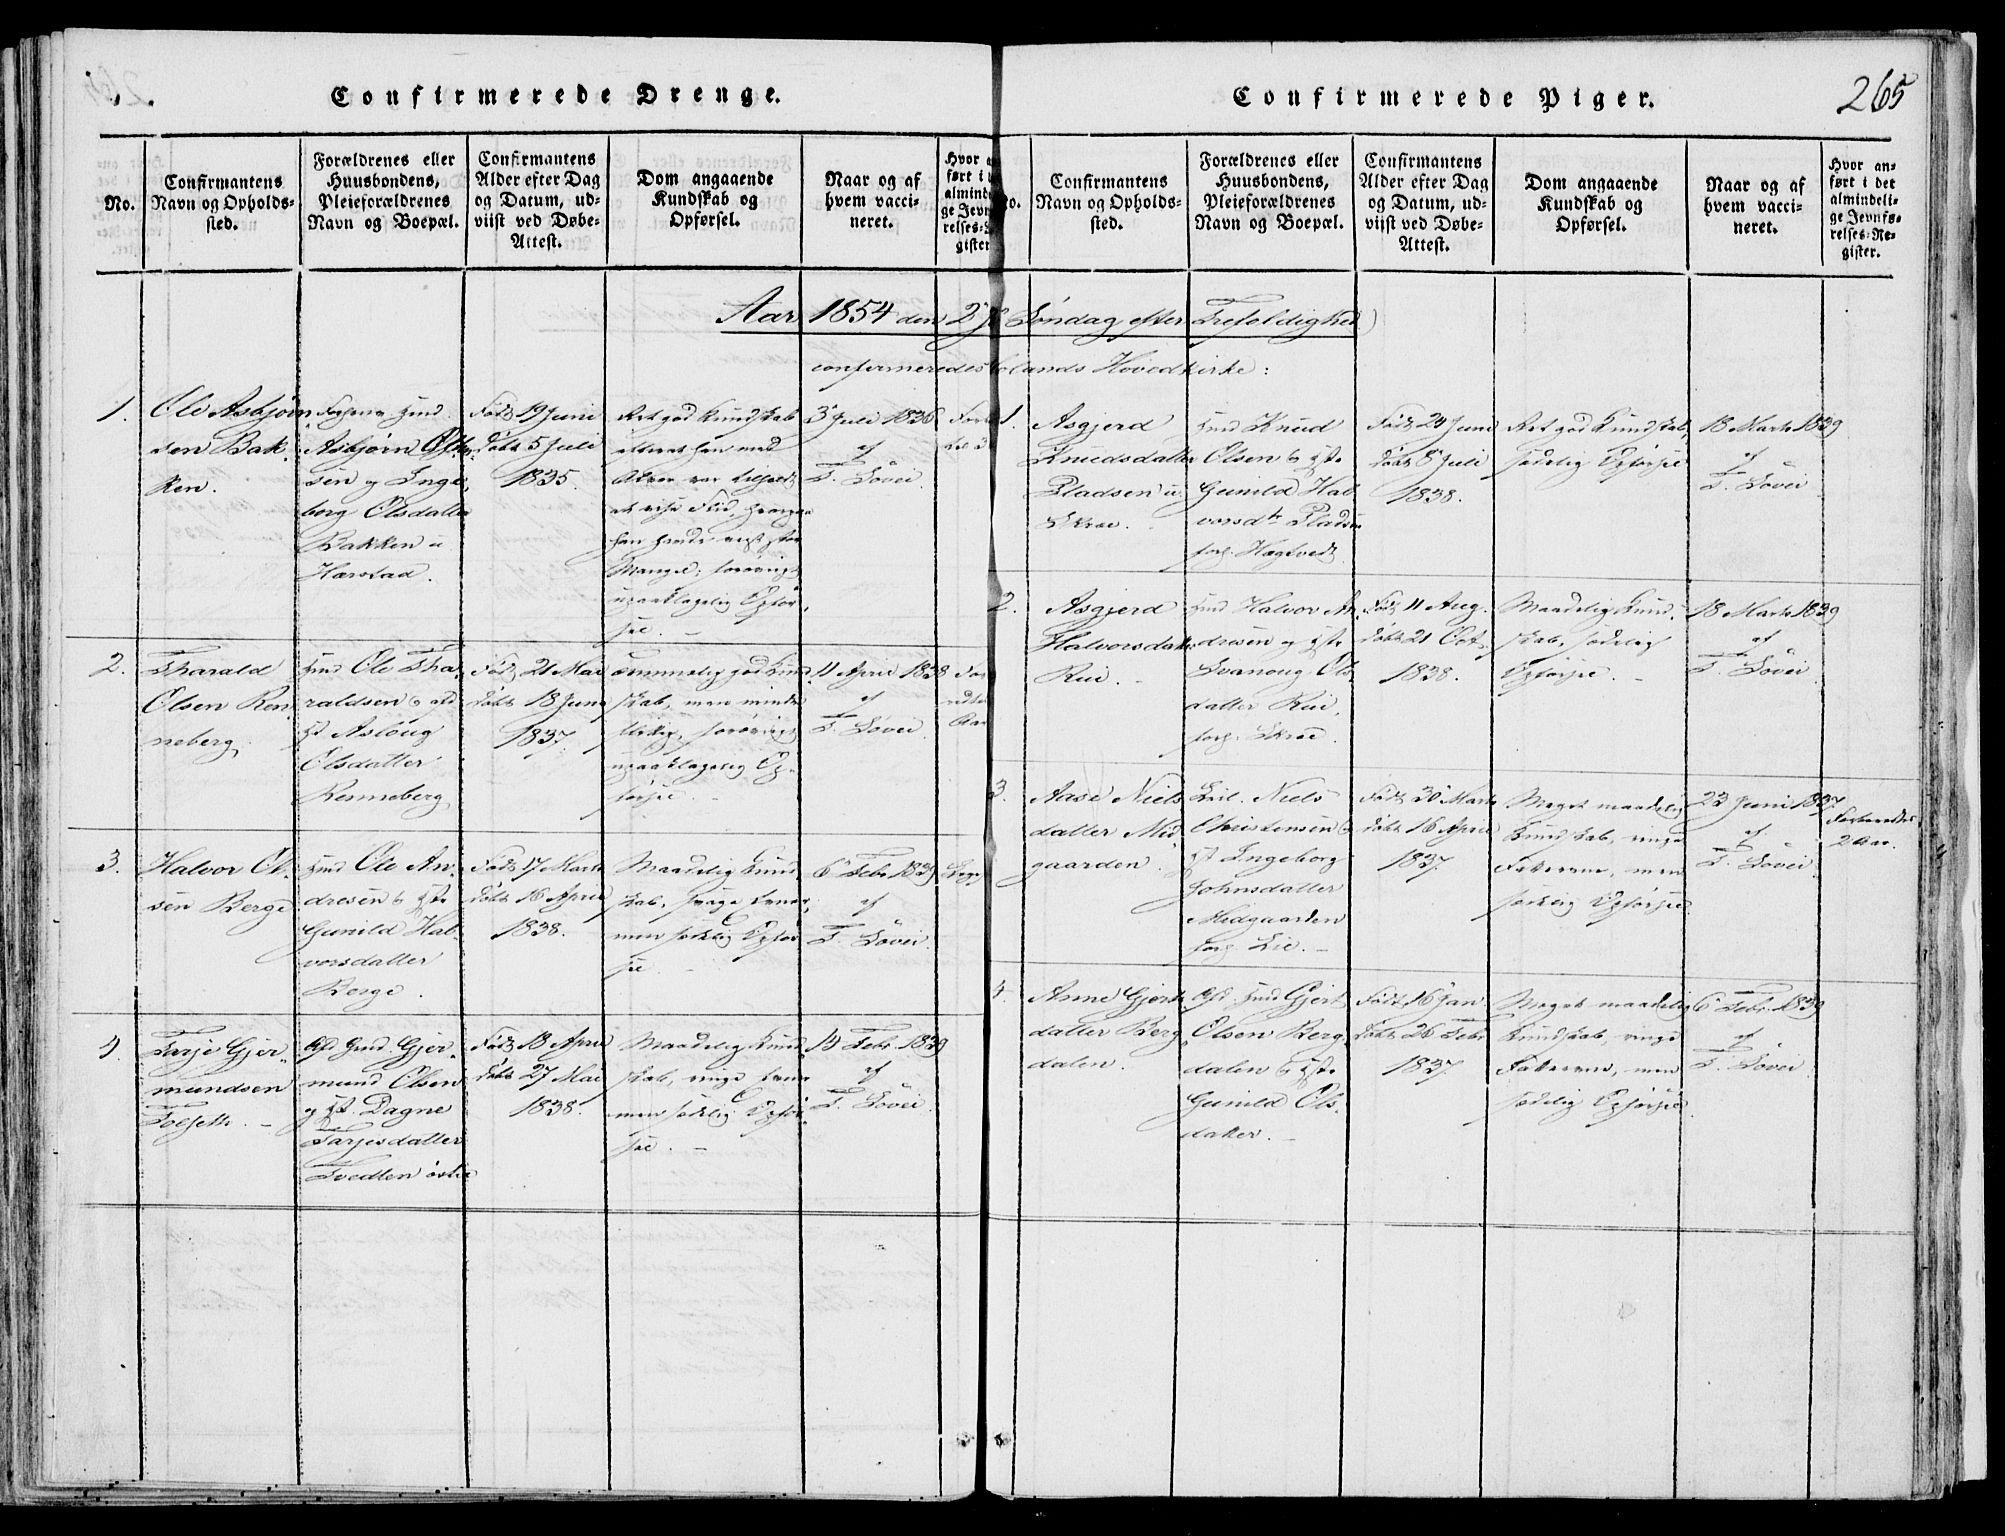 SAKO, Fyresdal kirkebøker, F/Fb/L0001: Ministerialbok nr. II 1, 1815-1854, s. 265